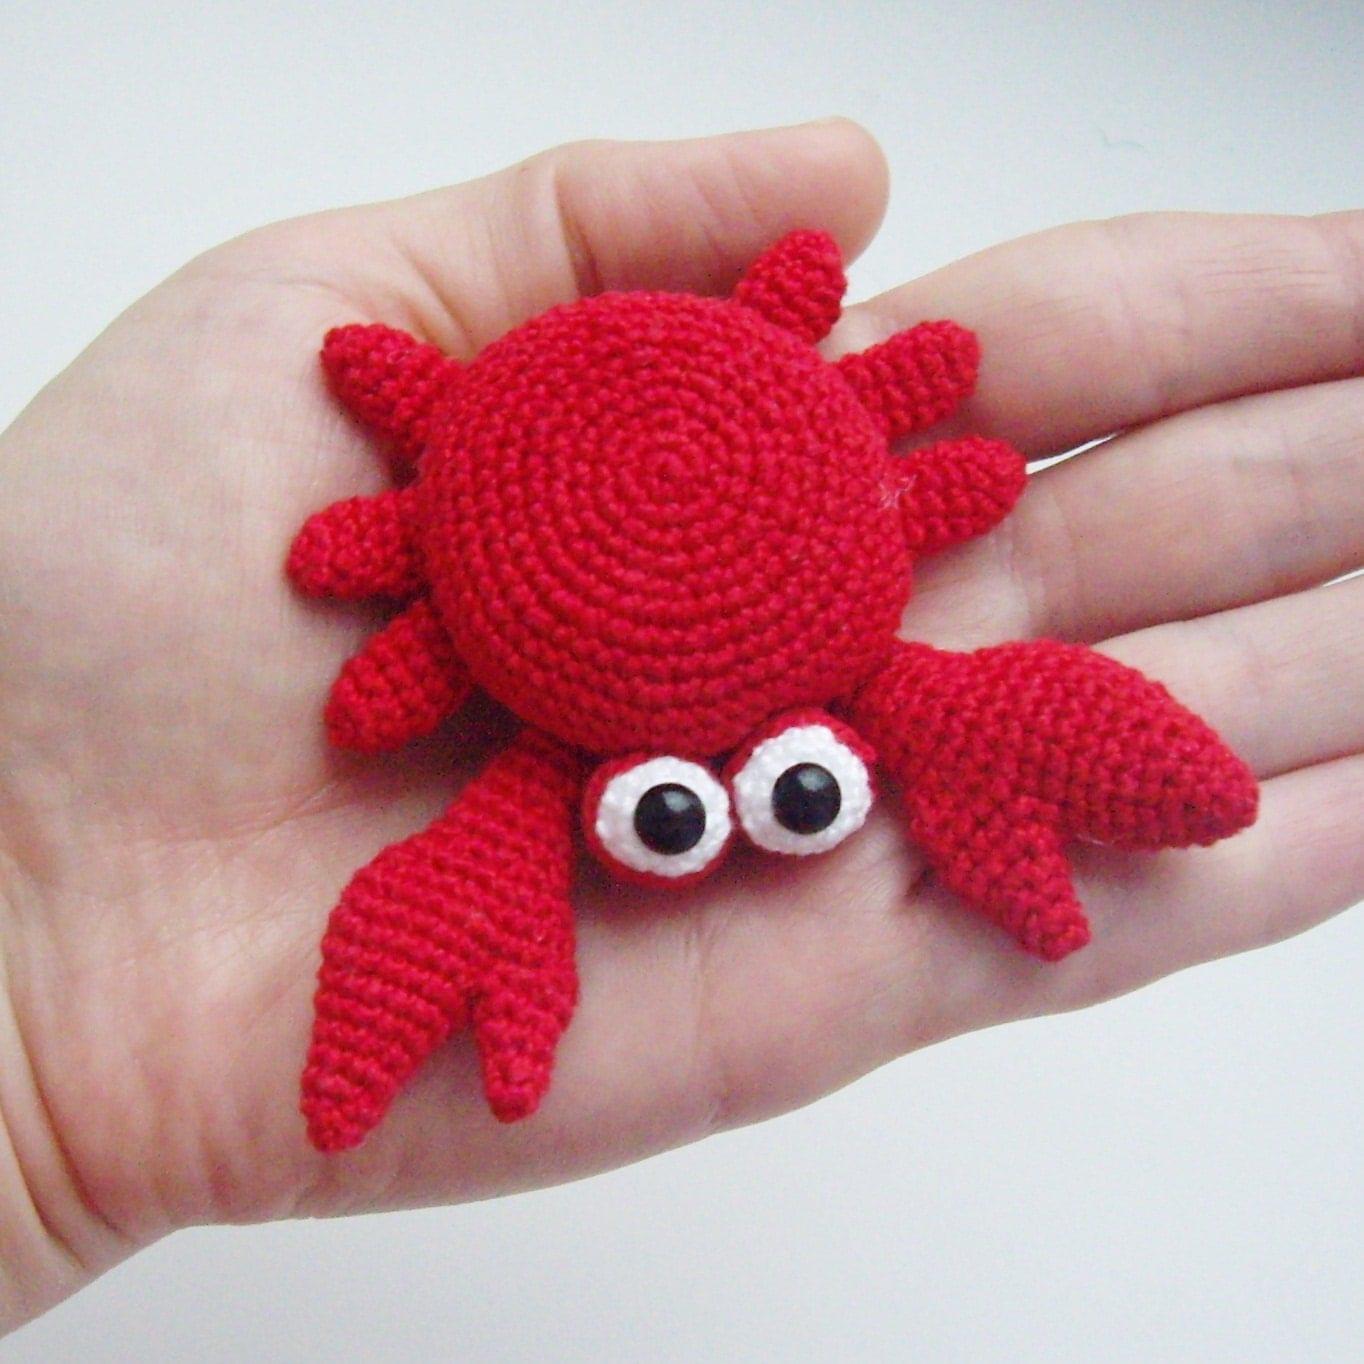 Crochet Amigurumi Crab : PDF PATTERN Crochet amigurumi toy Little red crab